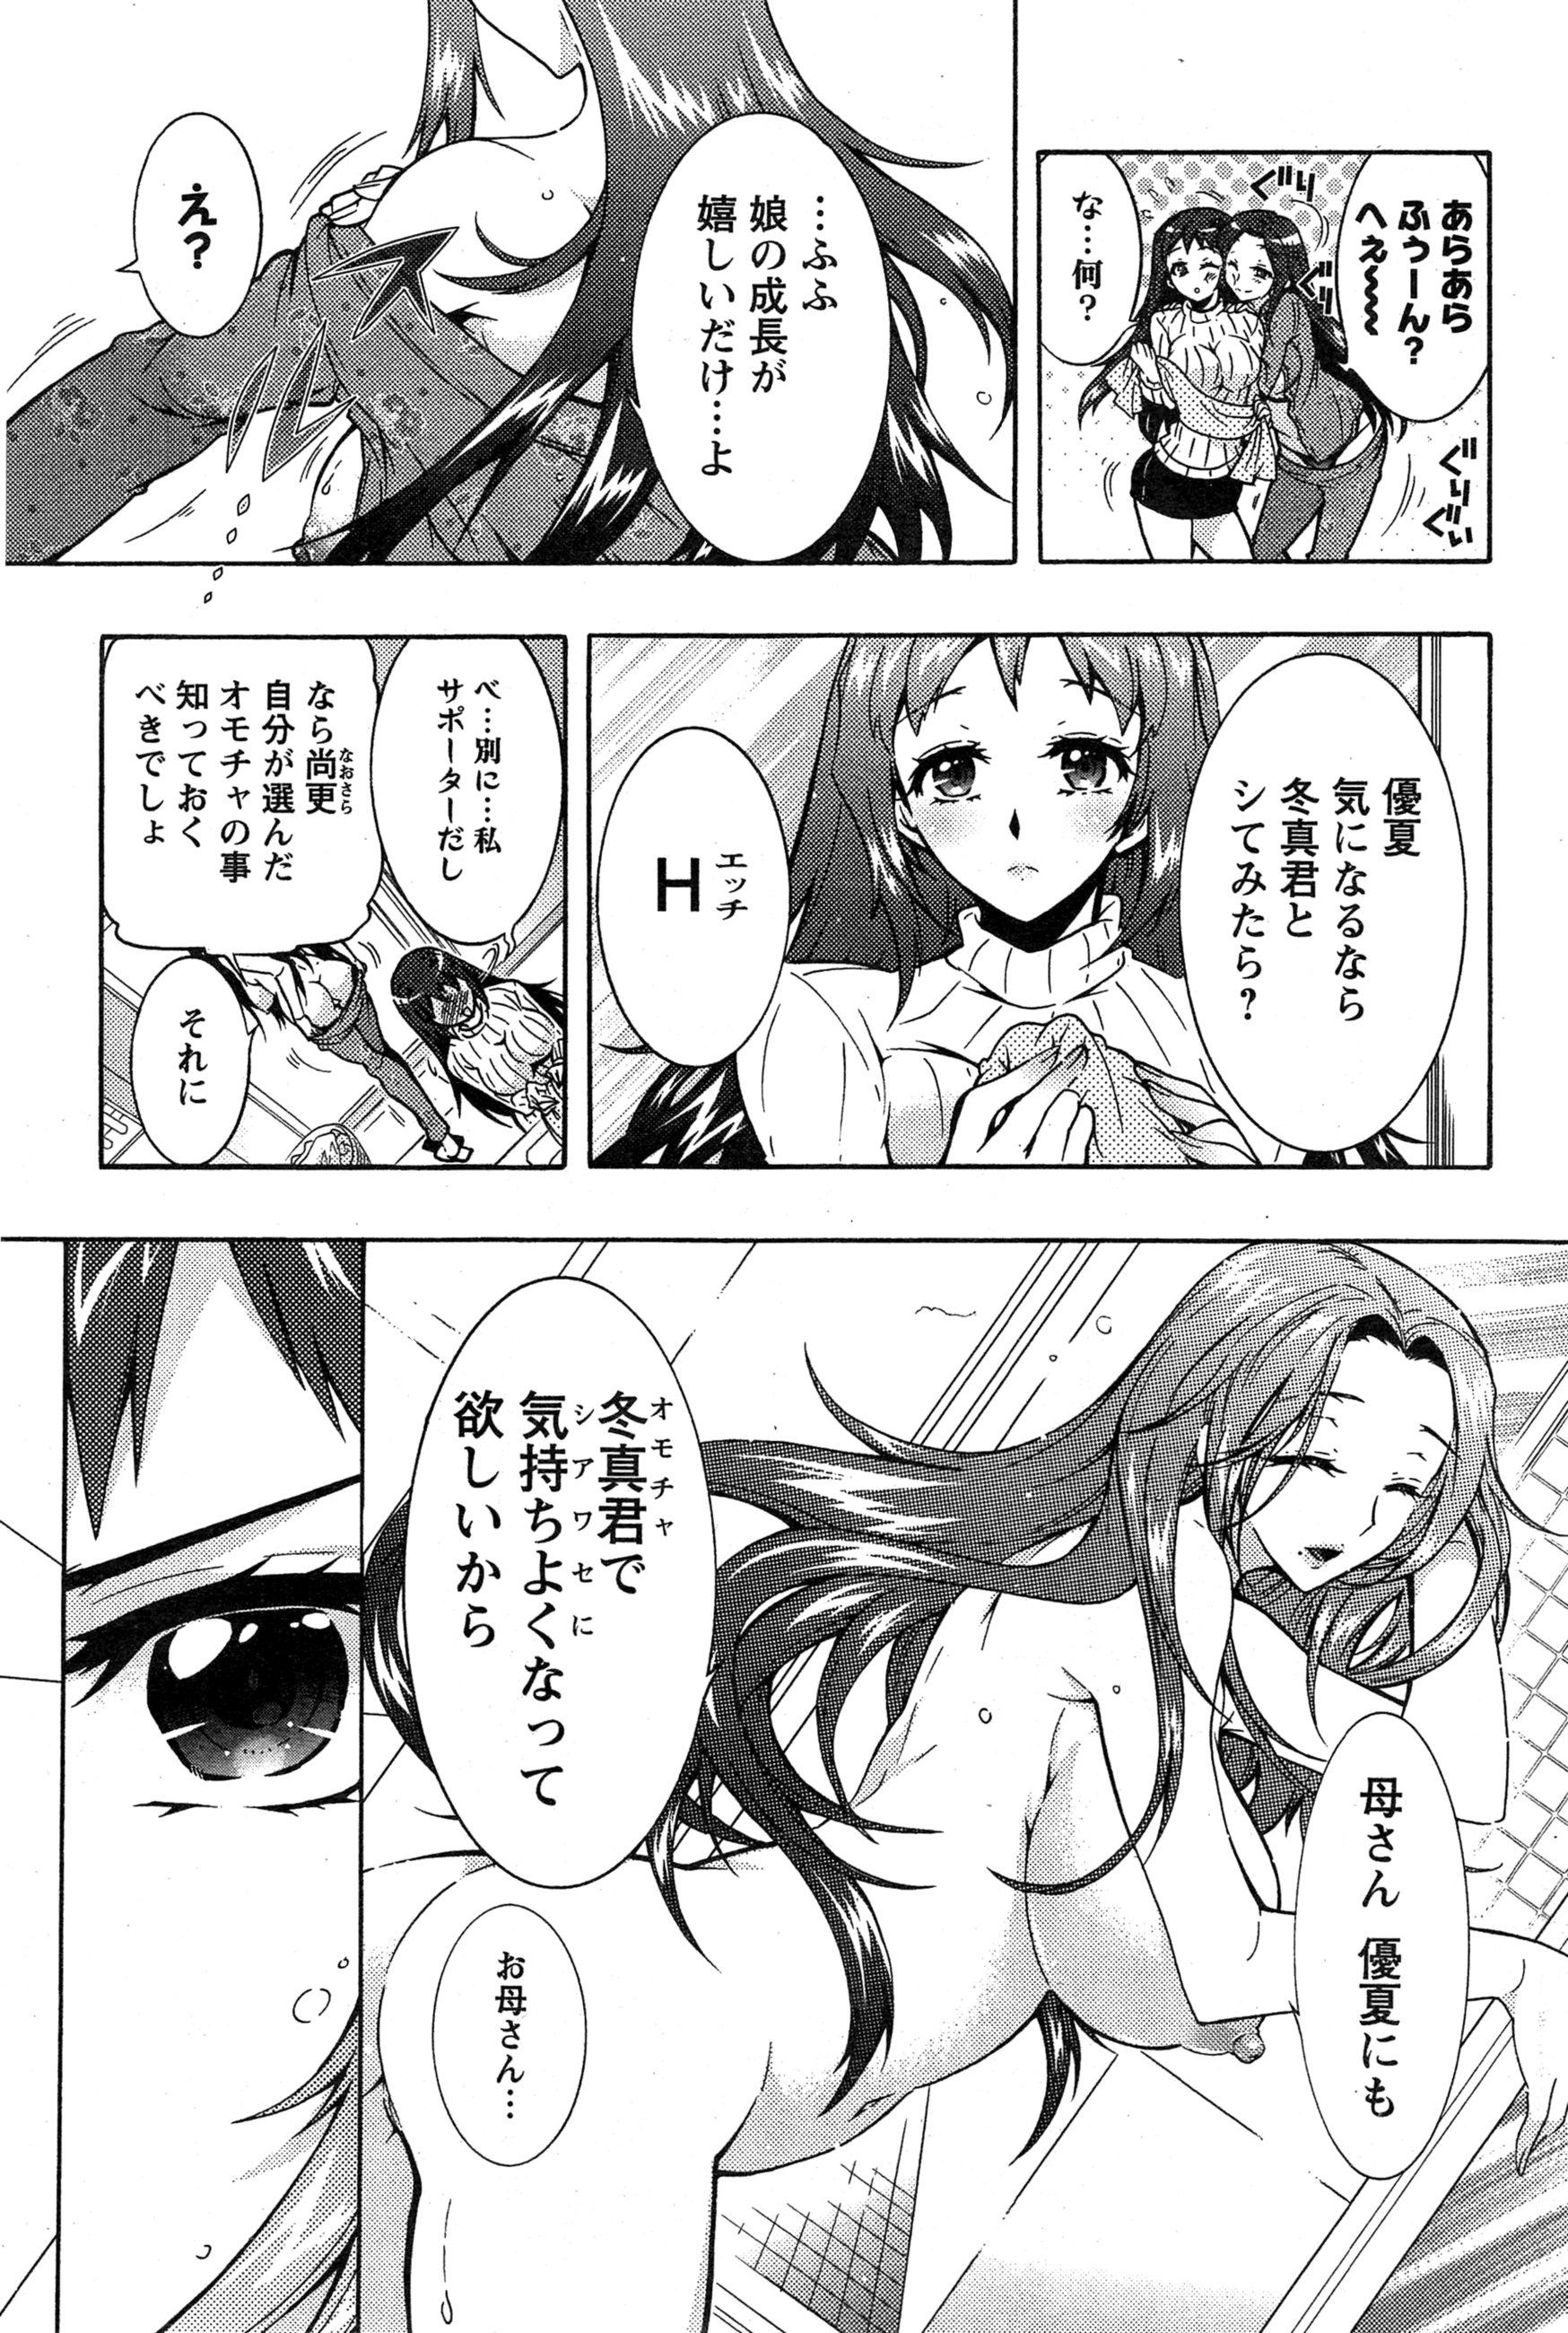 [Honda Arima] Sanshimai no Omocha - The Slave of Three Sisters Ch. 1-6 81